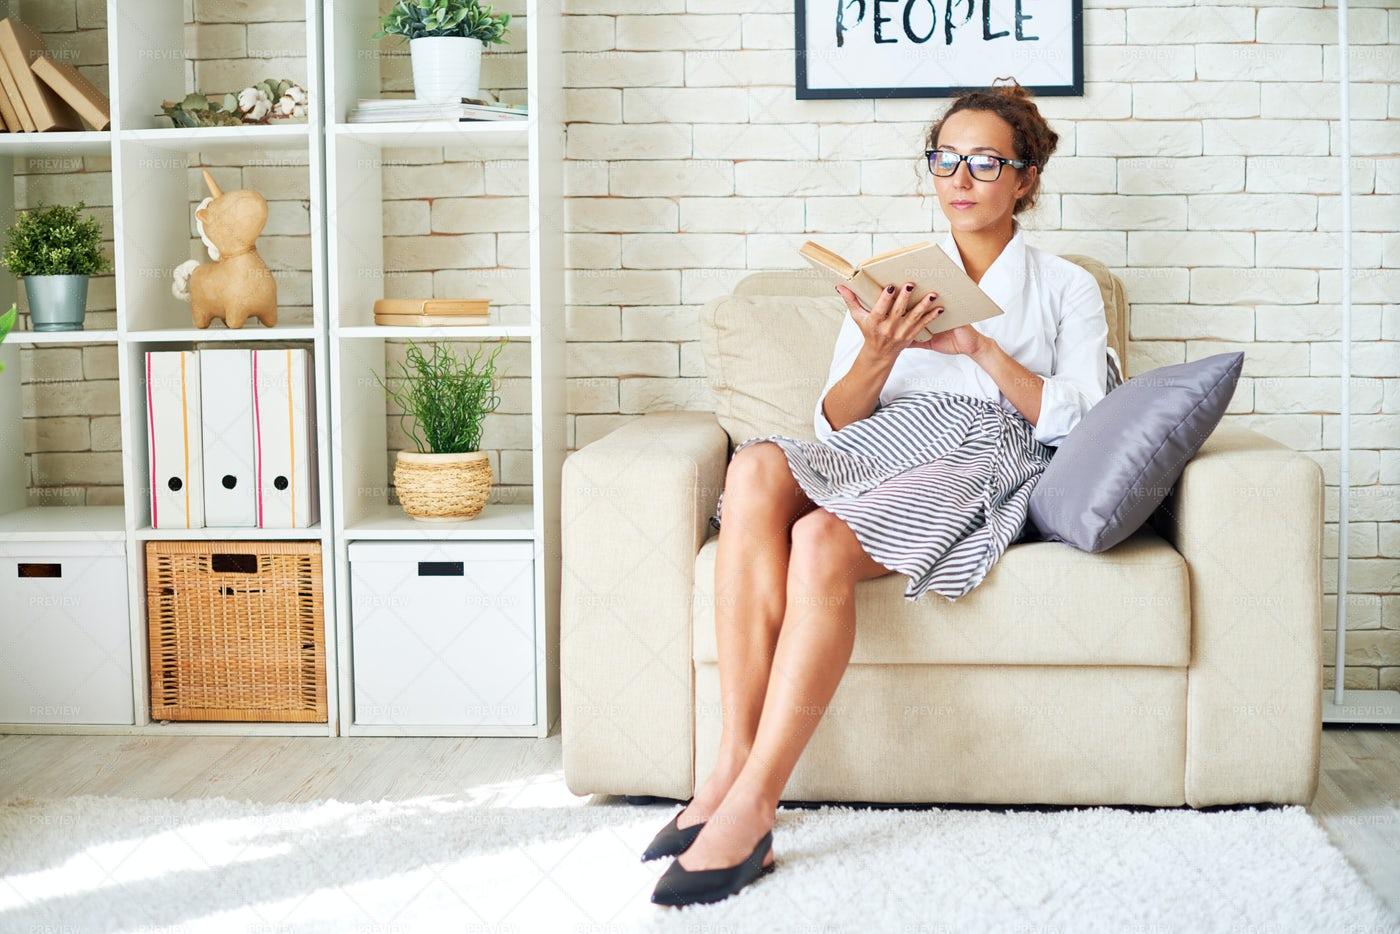 Elegant Young Woman Reading Book At...: Stock Photos